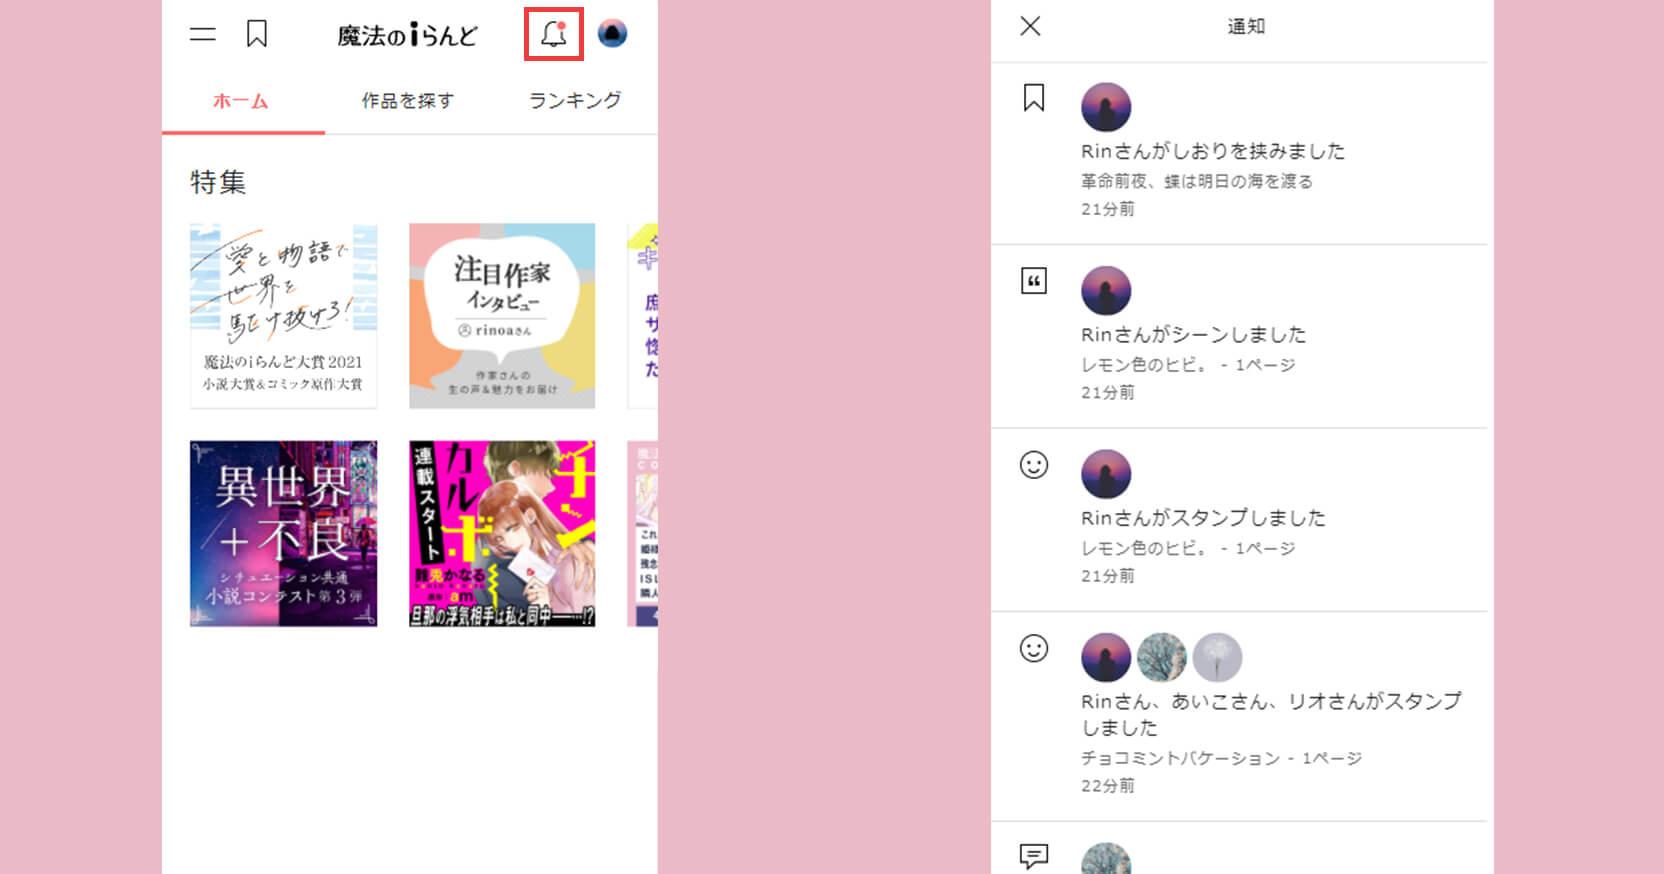 https://storage.googleapis.com/blog-info/entry/2021/06/tsuchi_blog.jpg